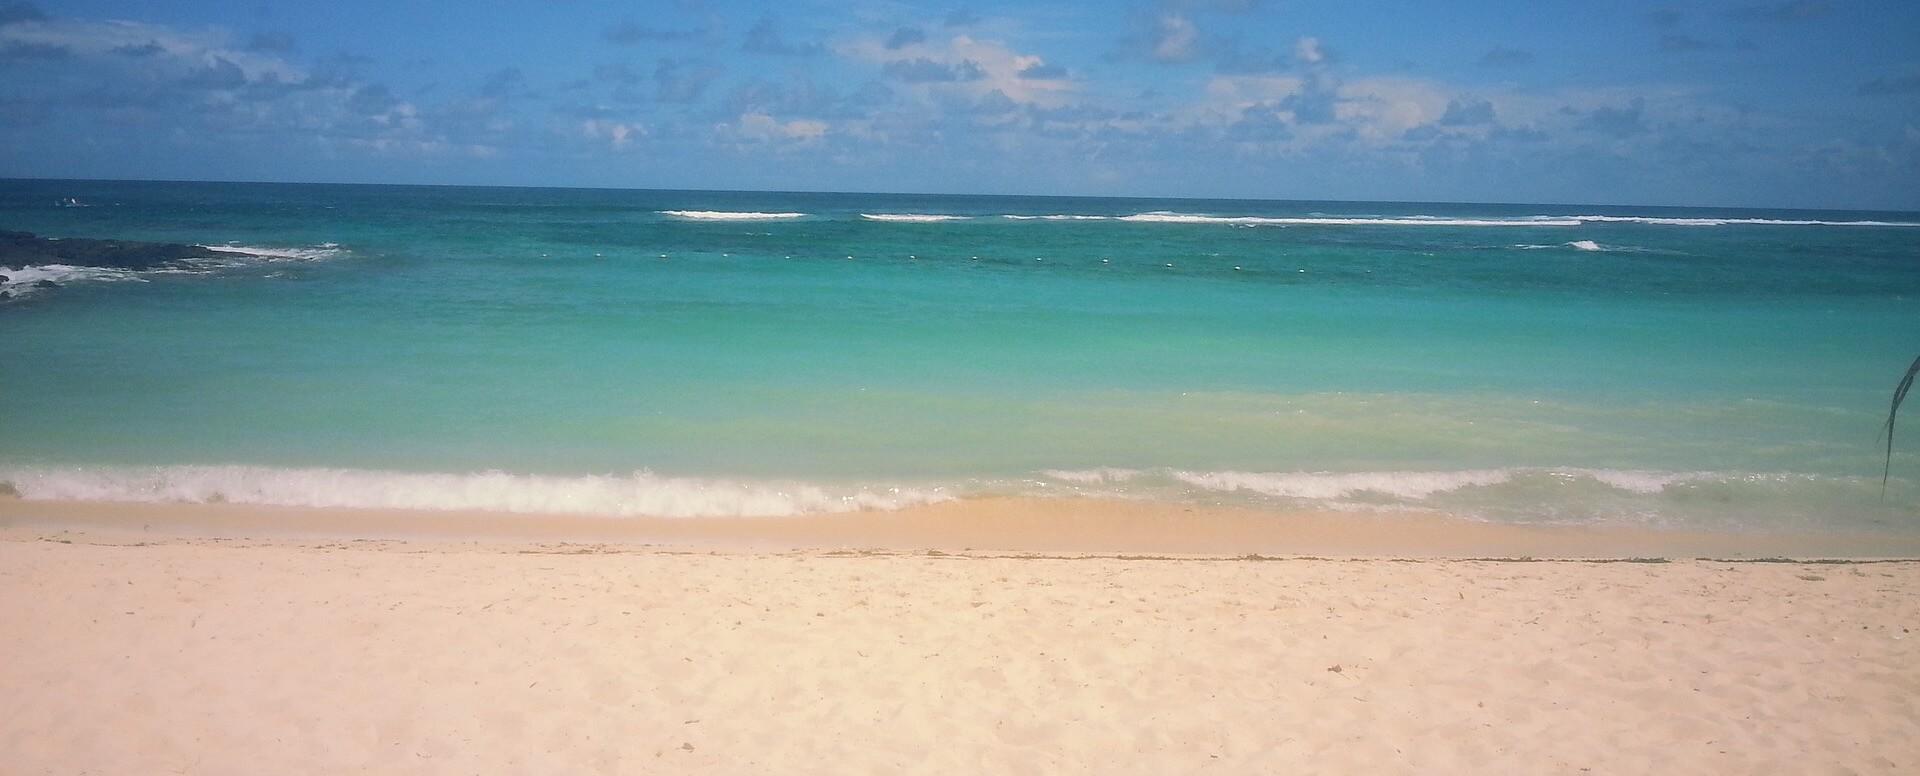 Southern Summer: December - May - Mauritius